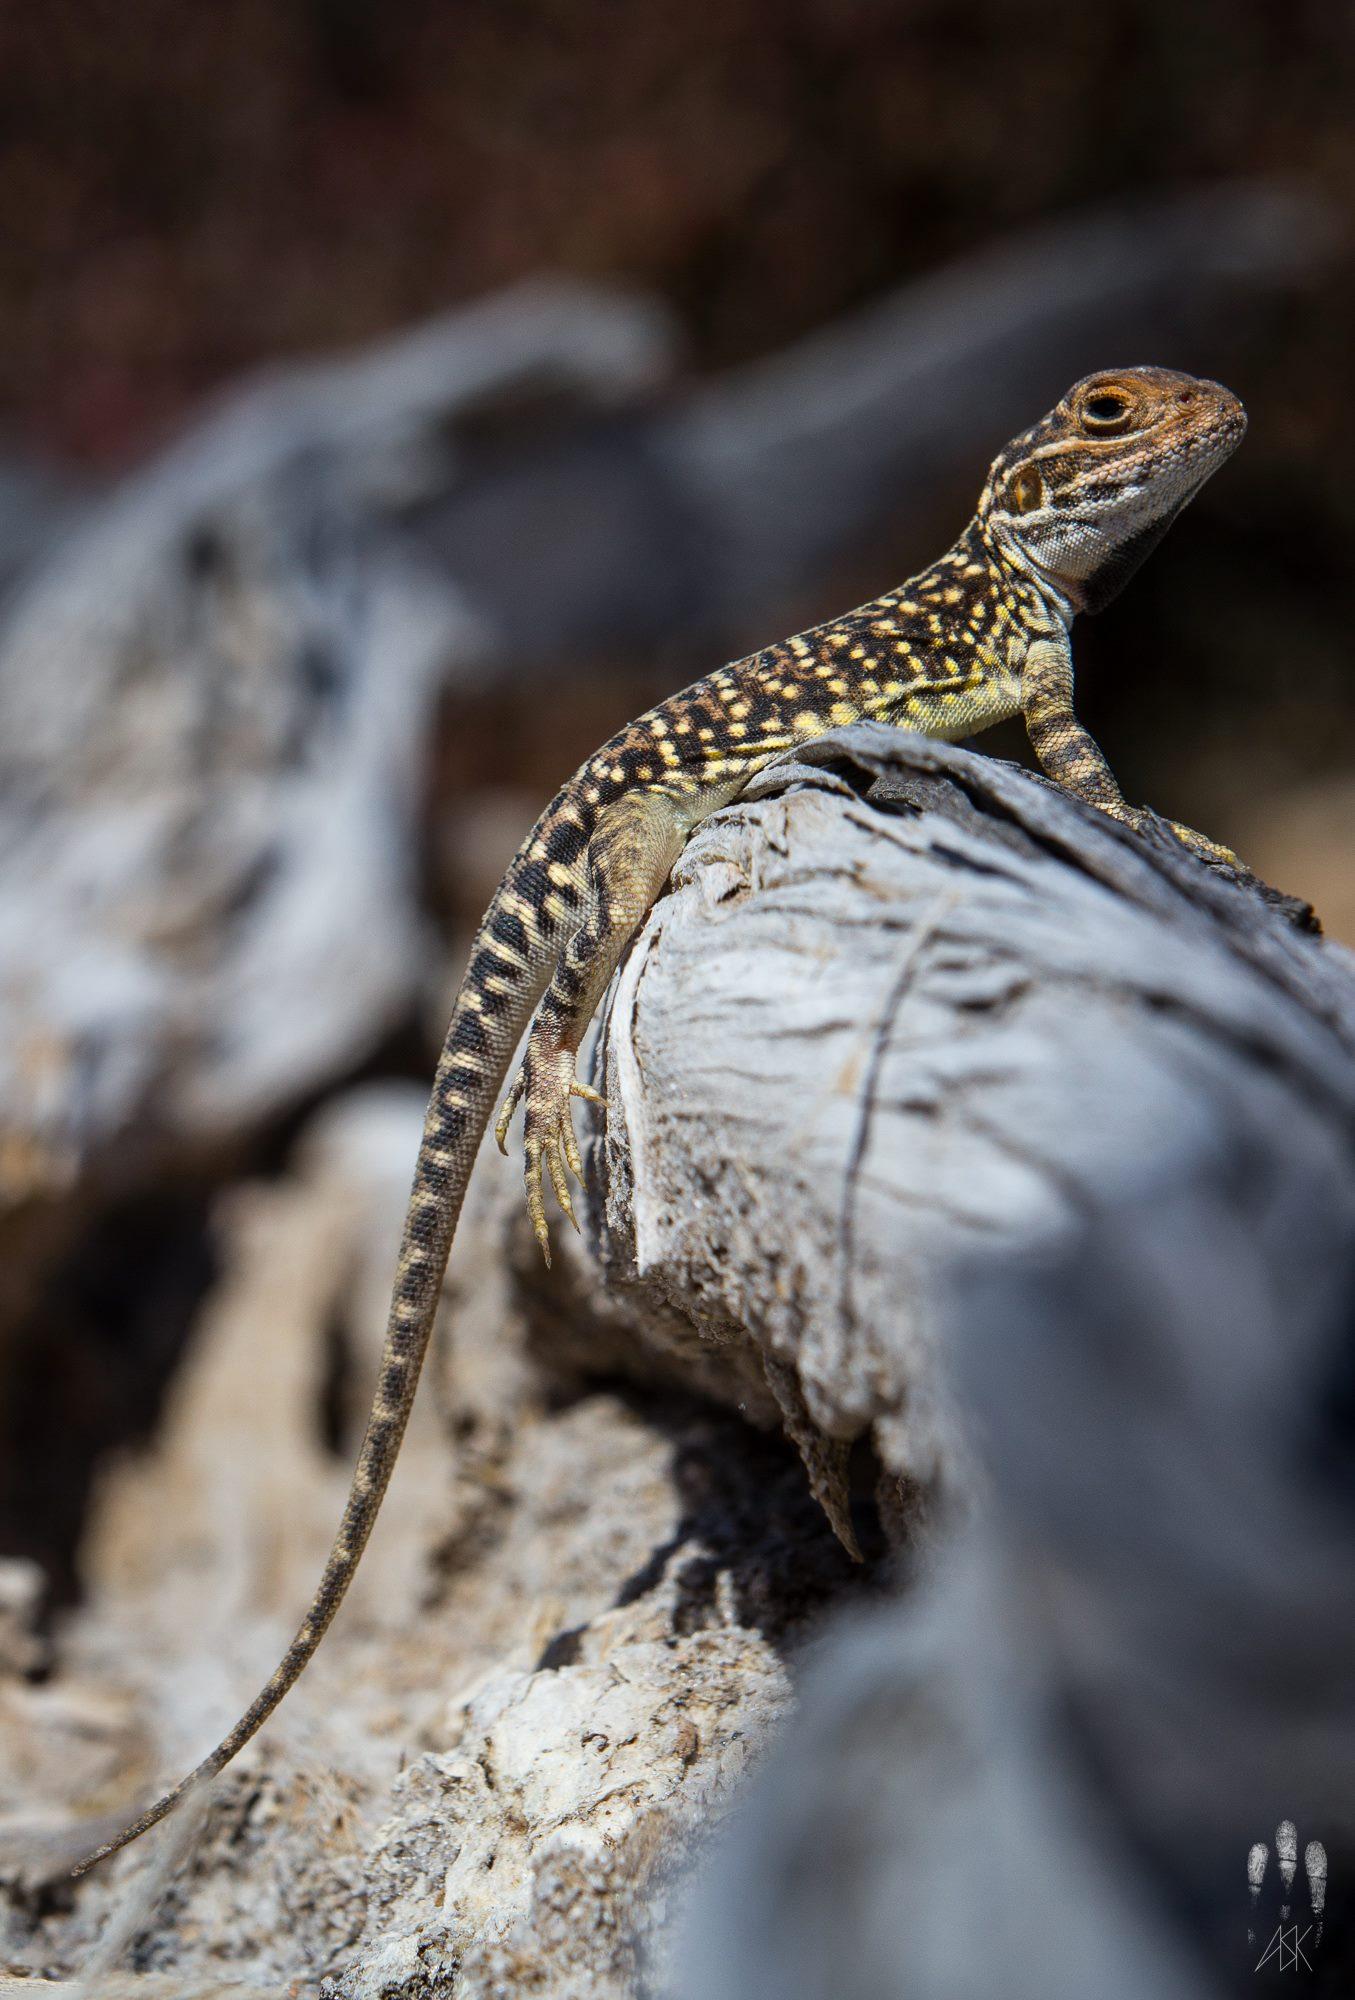 Male claypan dragon, Ctenophorus salinarum . Varley, Western Australia, 2013. Photo by Angus Kennedy.